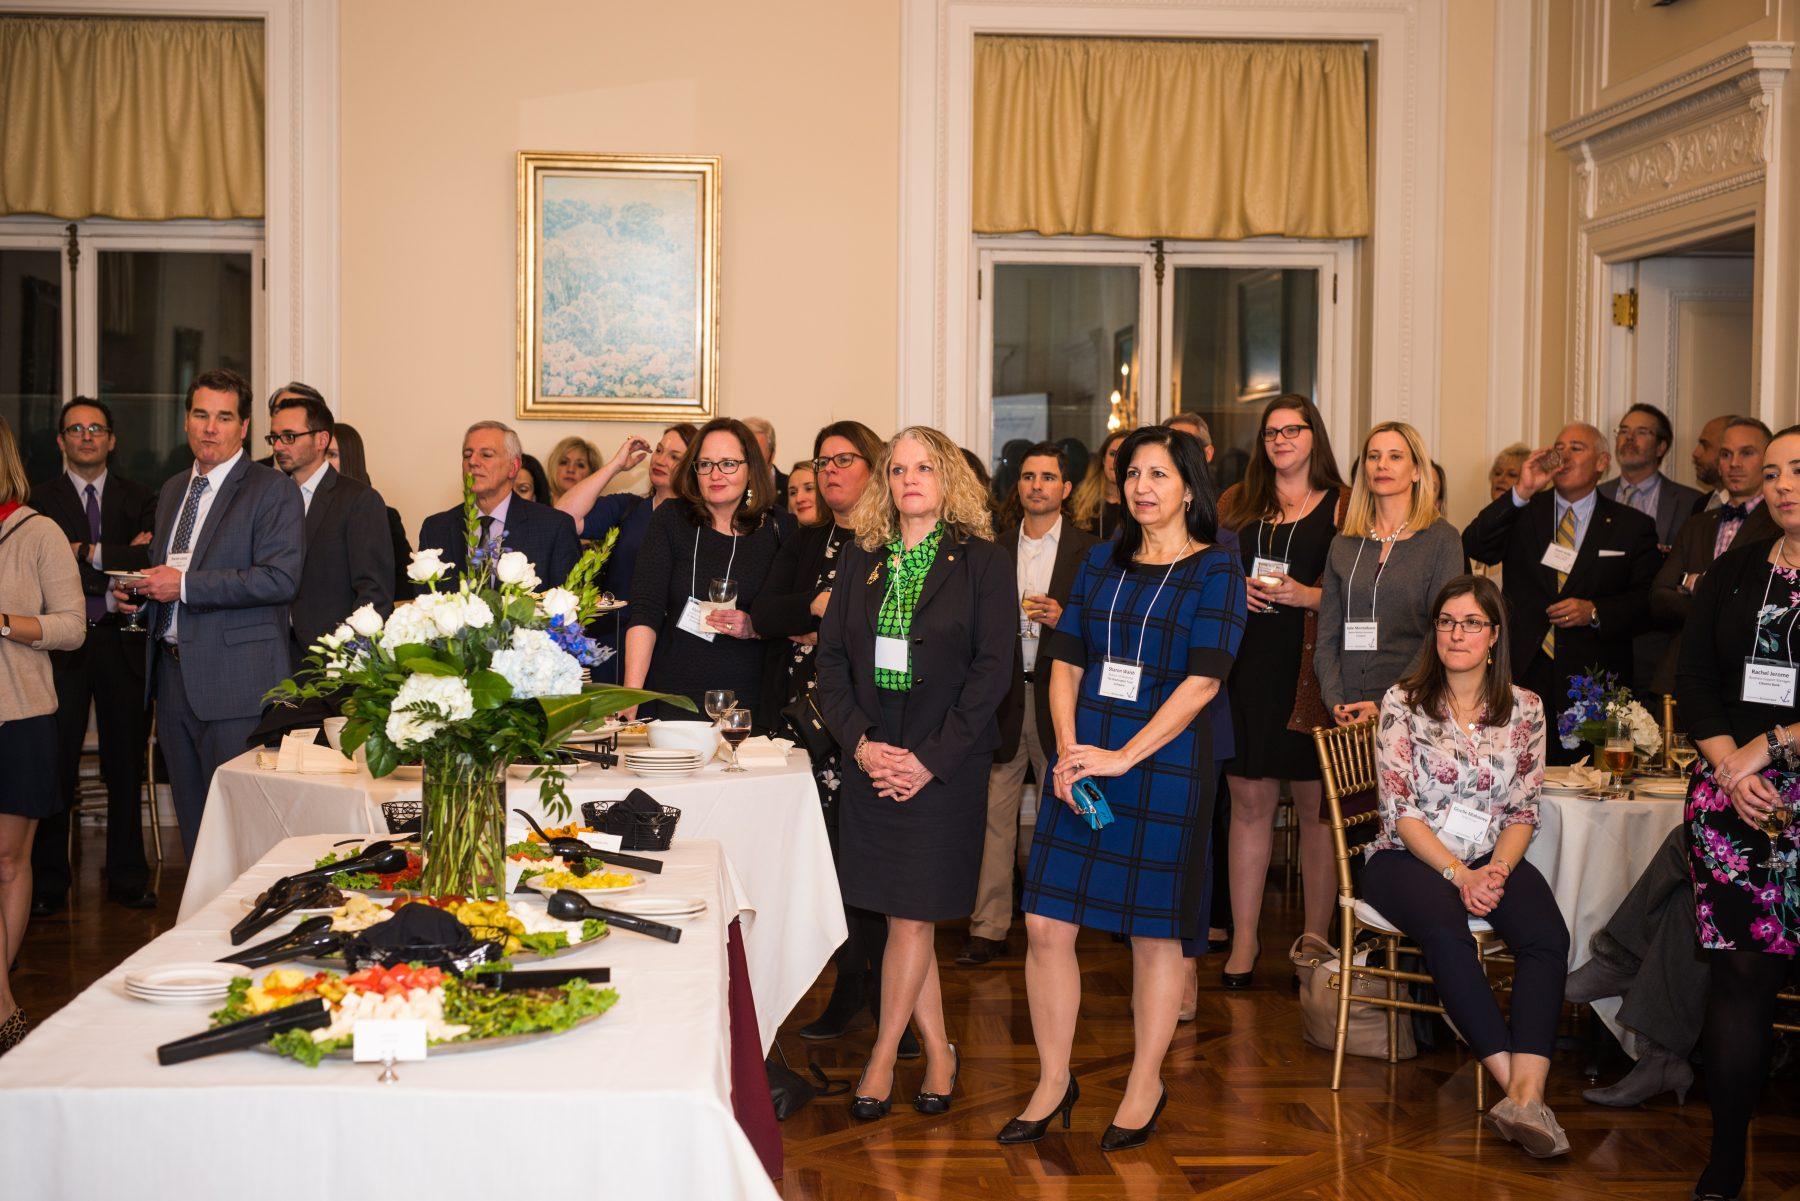 Aldrich Mansion Warwick RI Monthly 2019 Common Good Awards Blueflash Photography 9